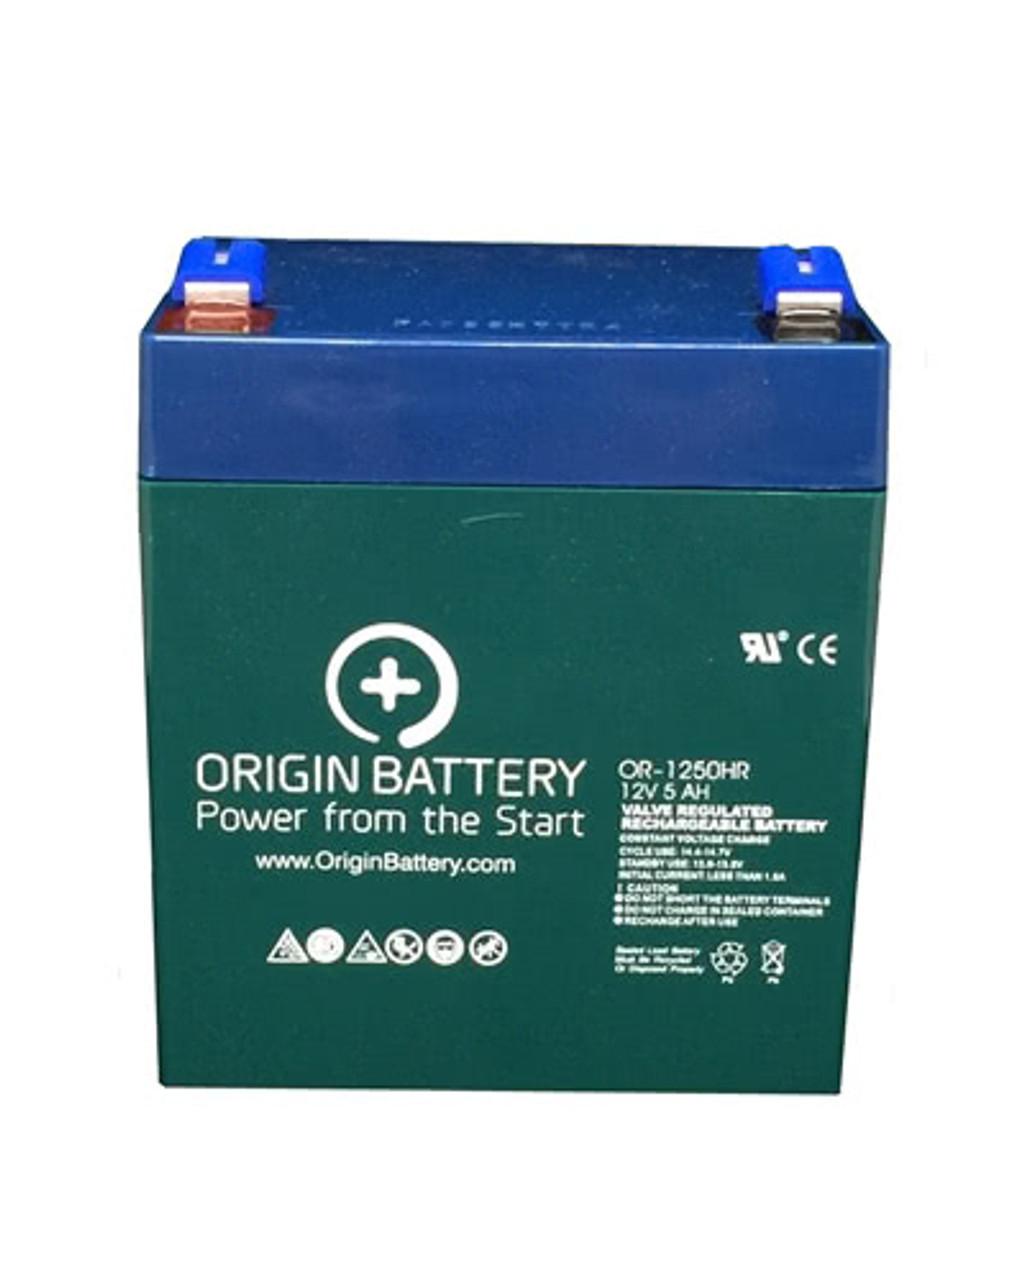 Minuteman 600 Replacement Battery